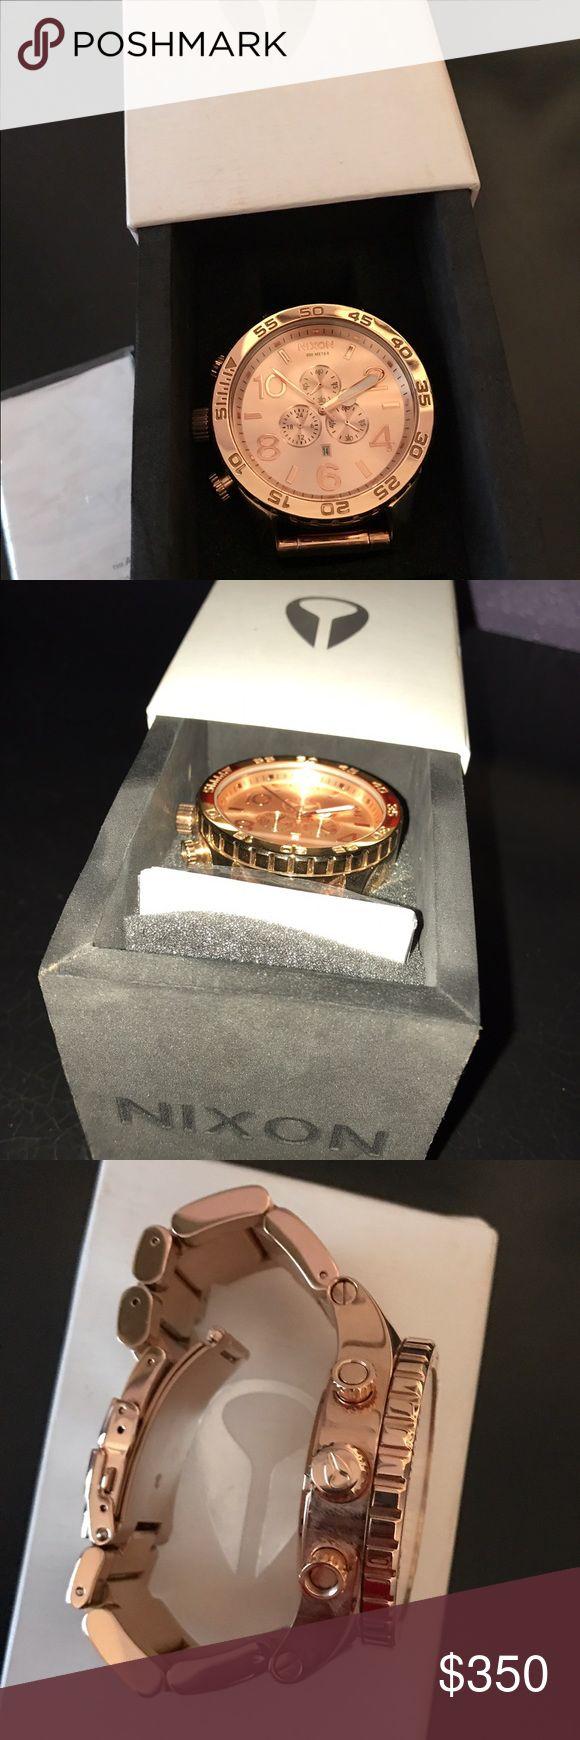 Nixon 51-30 Rose gold watch Big face watch, rose gold. Nixon Accessories Watches